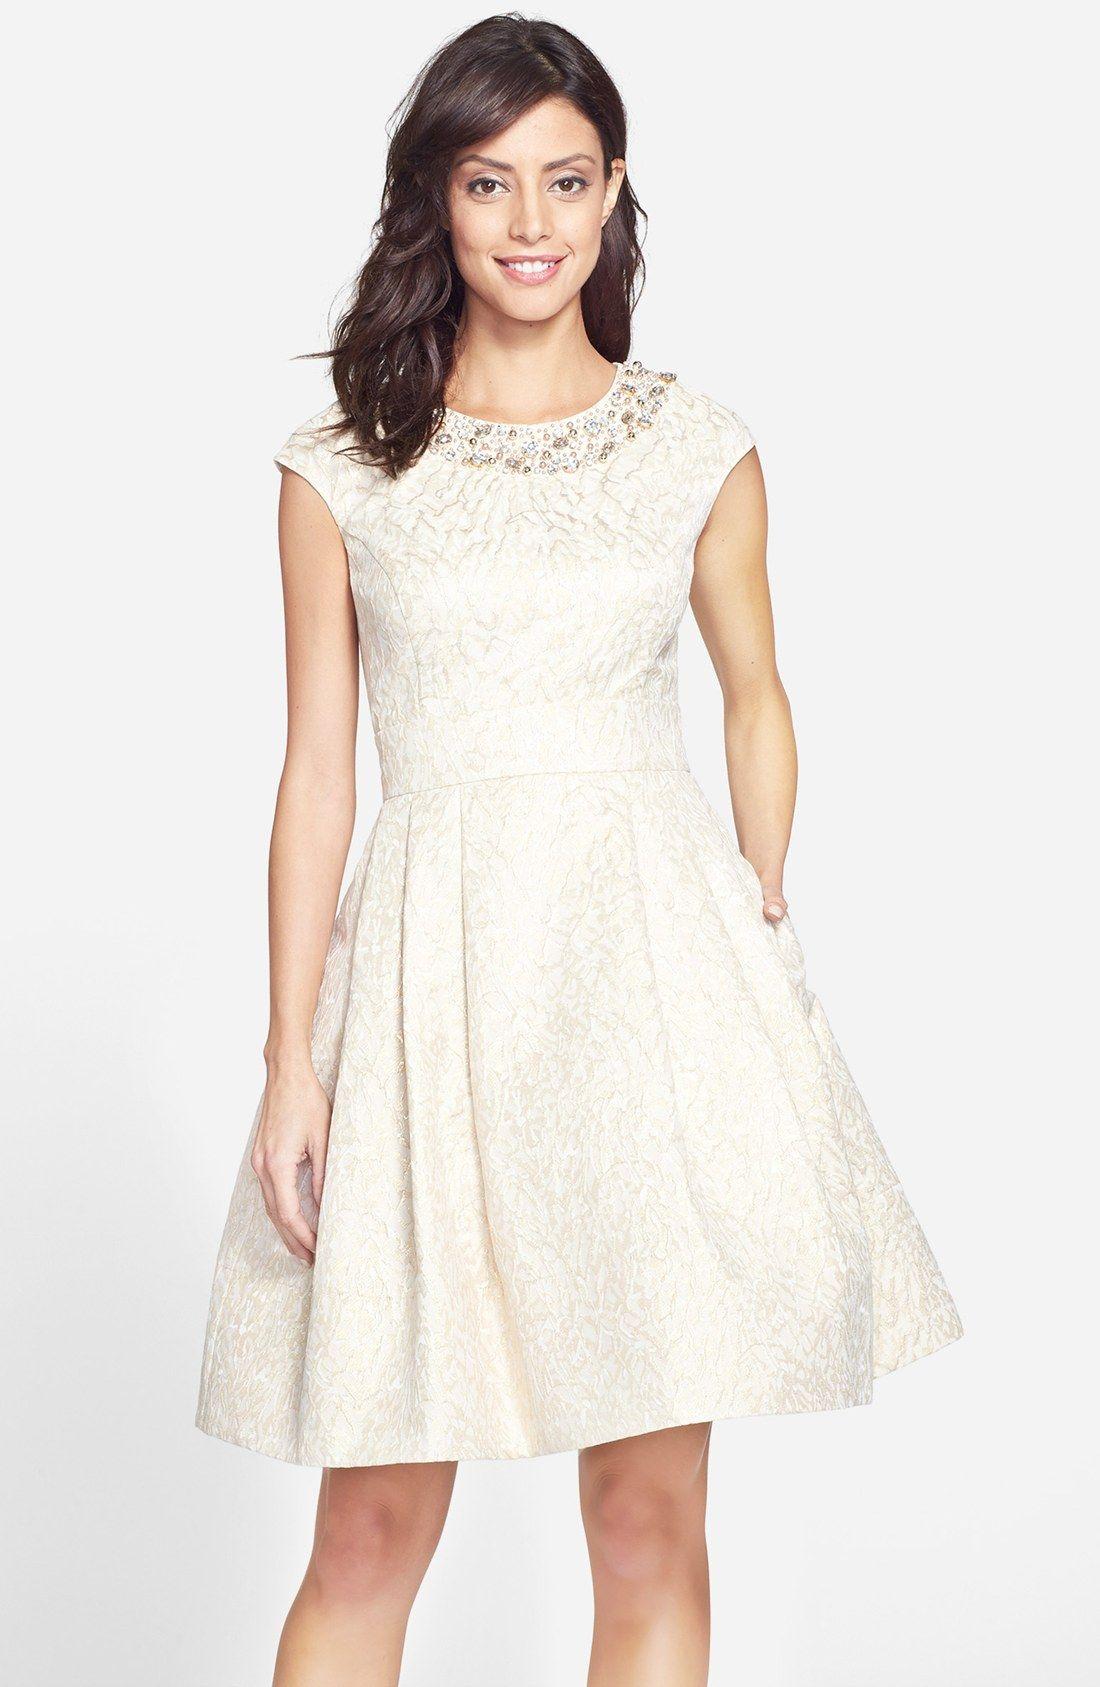 Fit and flare dress wedding  Eliza J Embellished Jacquard Fit u Flare Dress  showered with love